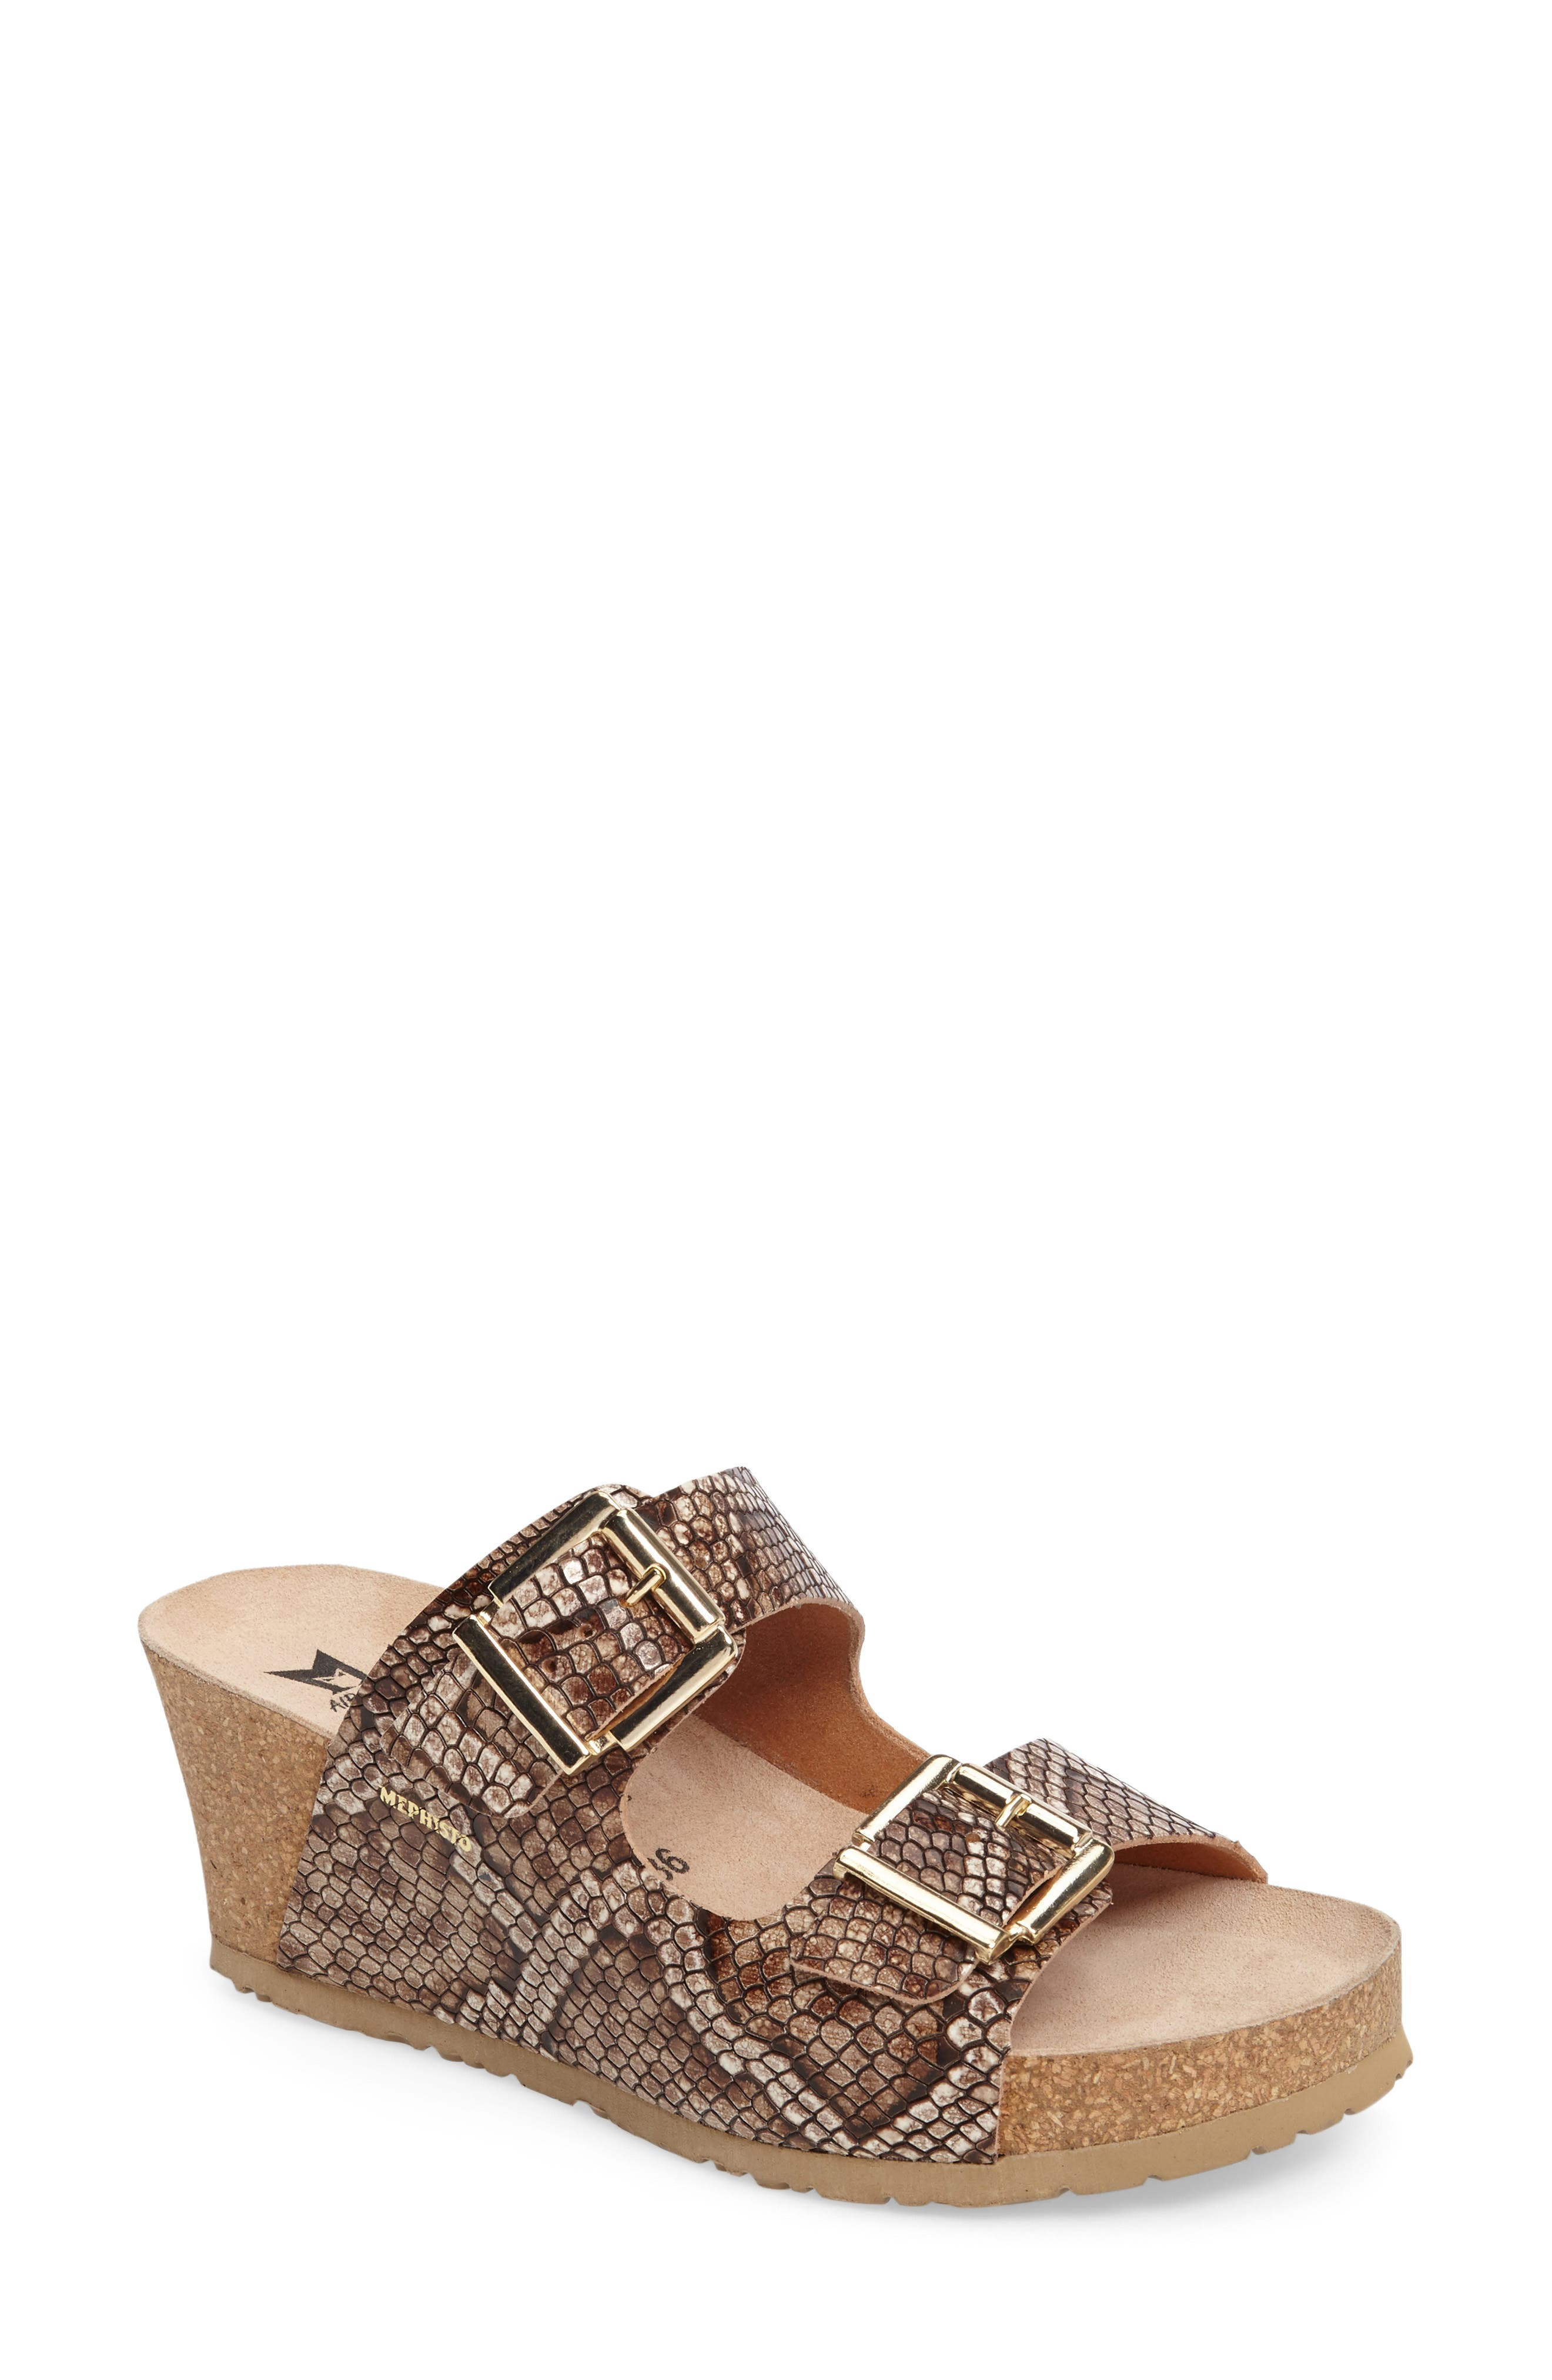 Lenia Wedge Sandal,                             Main thumbnail 1, color,                             Brown Leather